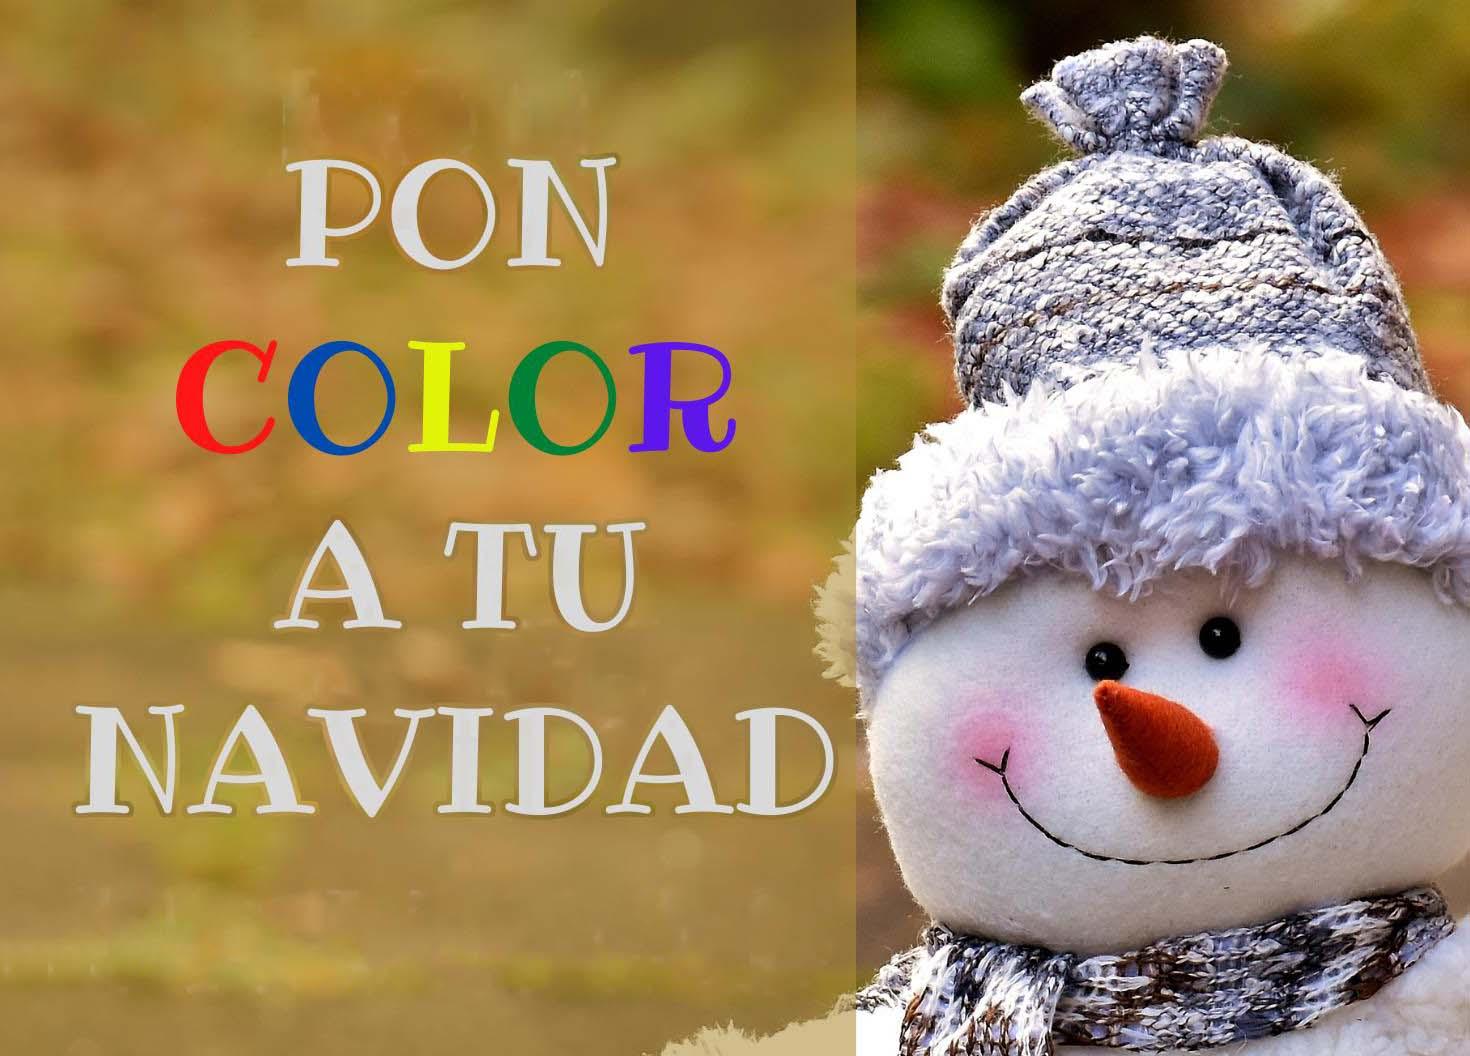 PON COLOR A TU NAVIDAD-cover